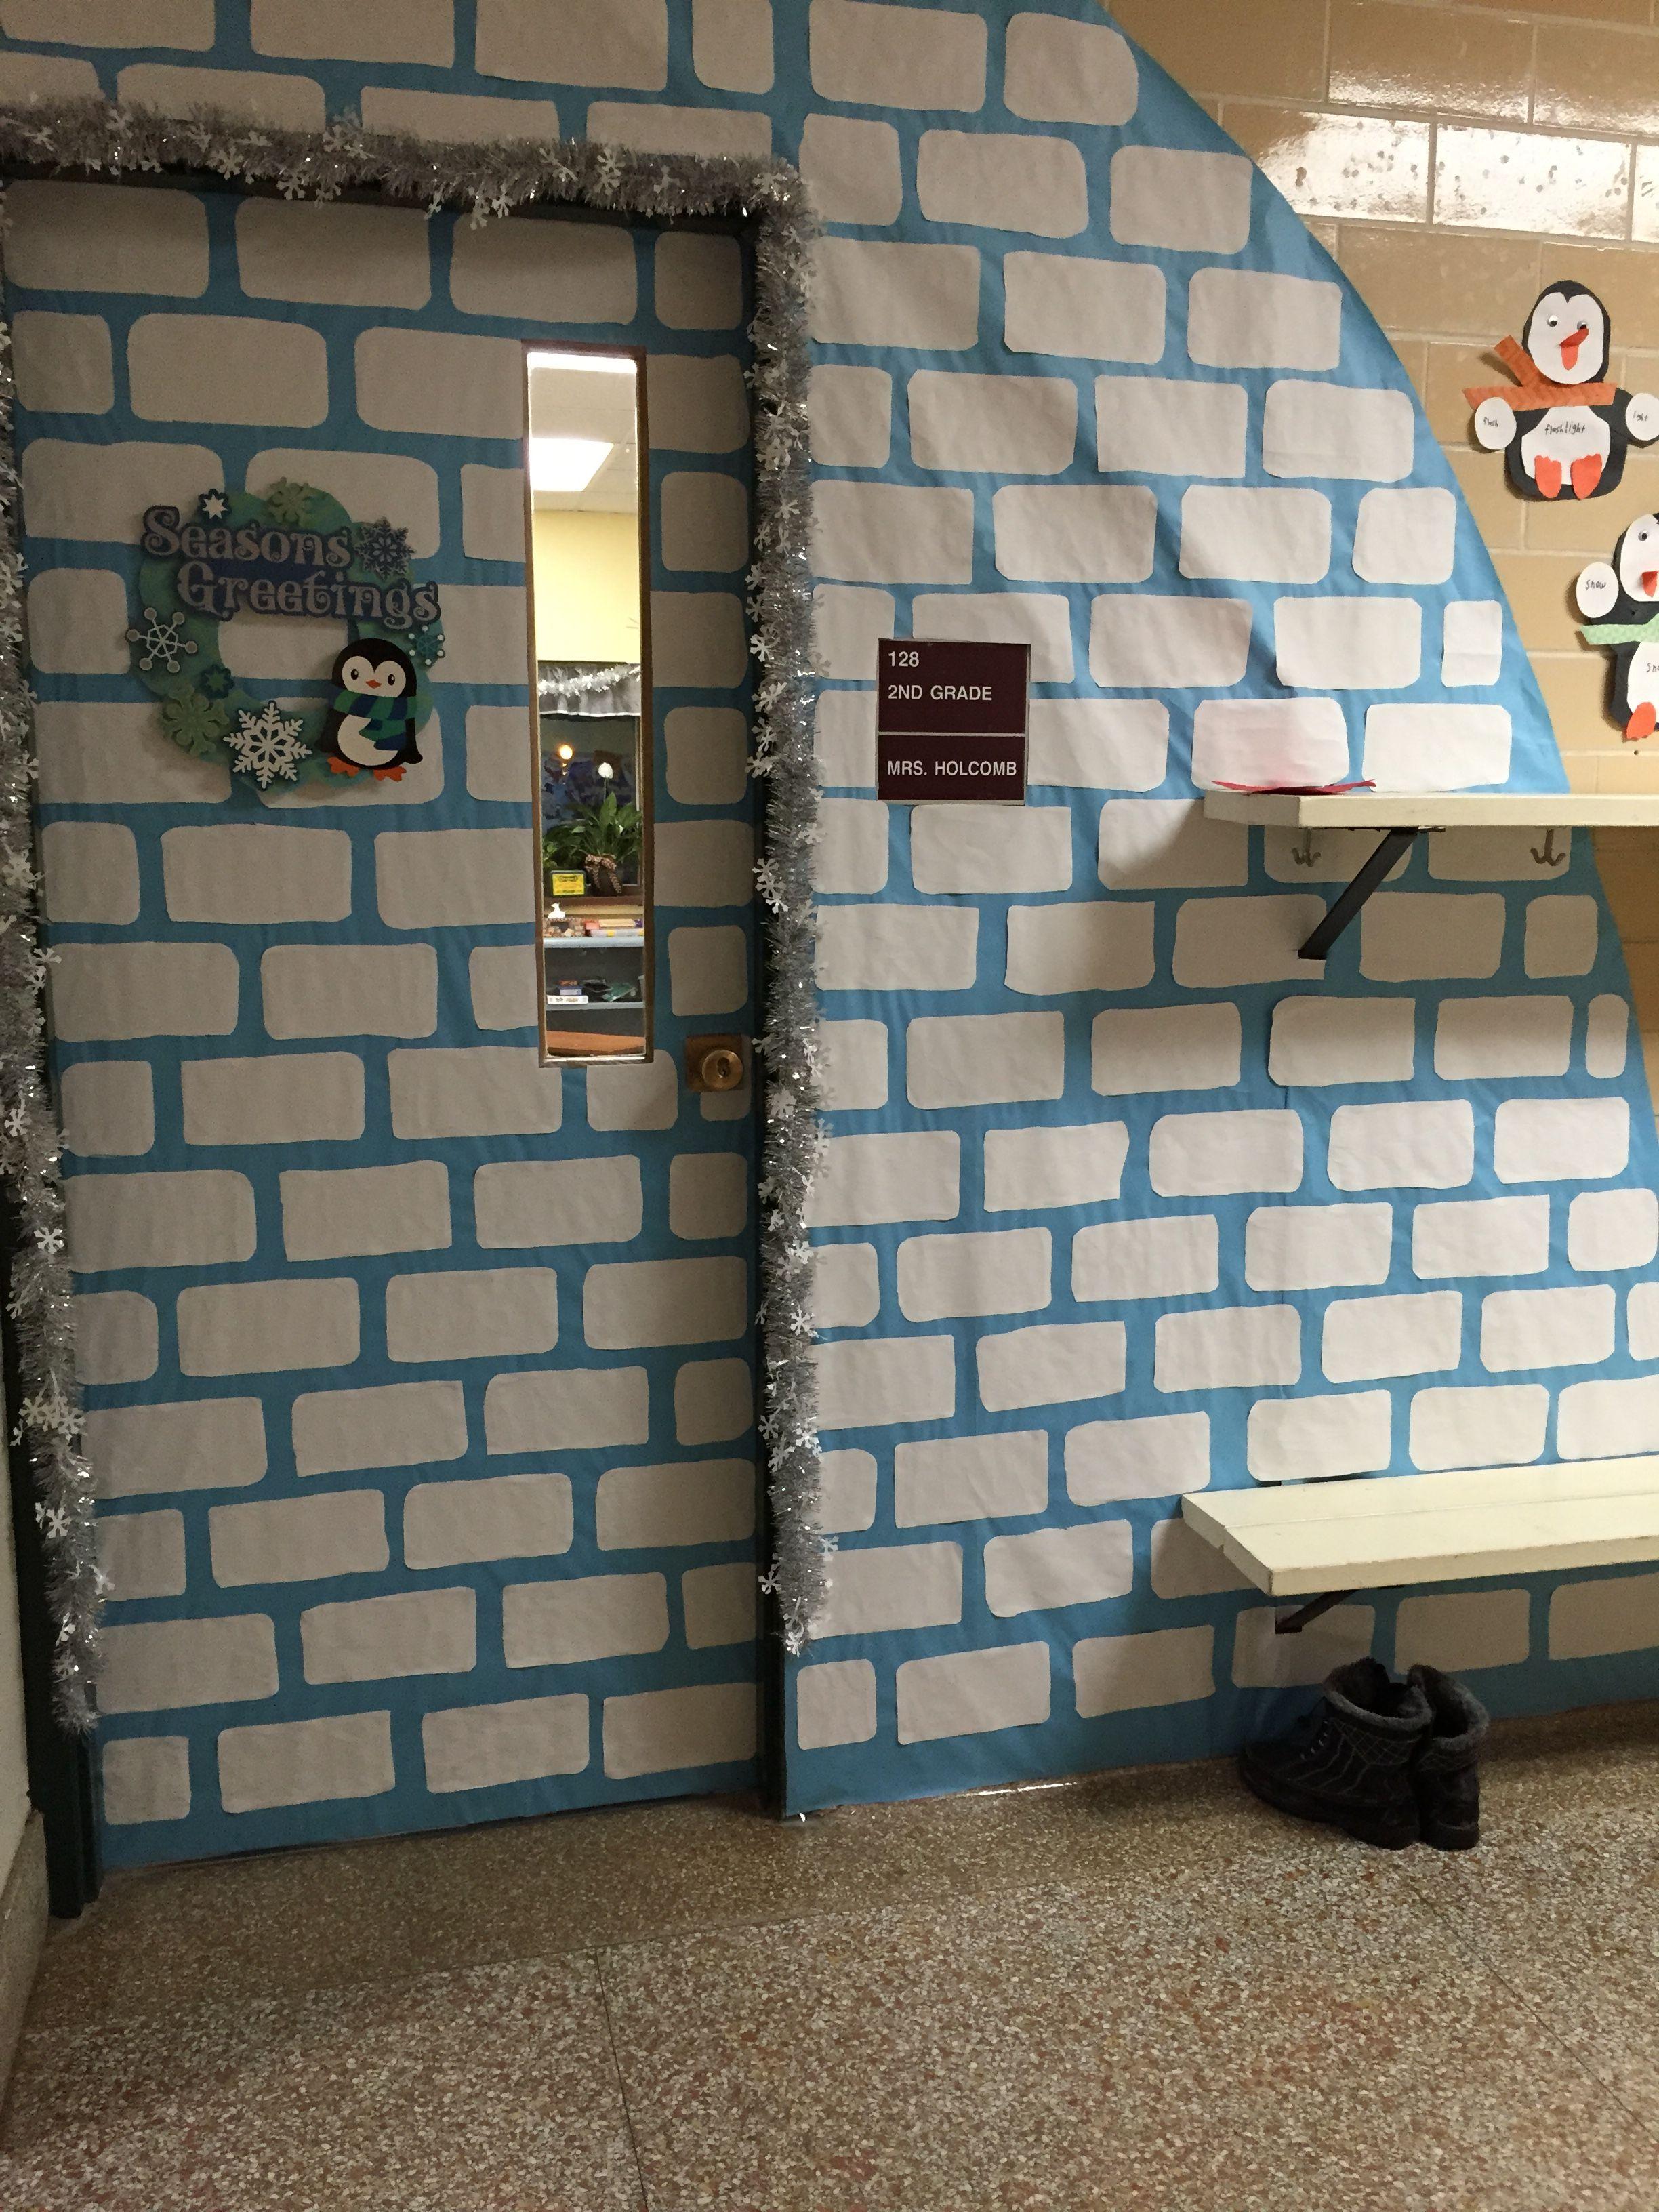 Classroom igloo door decoration for the winter season ...